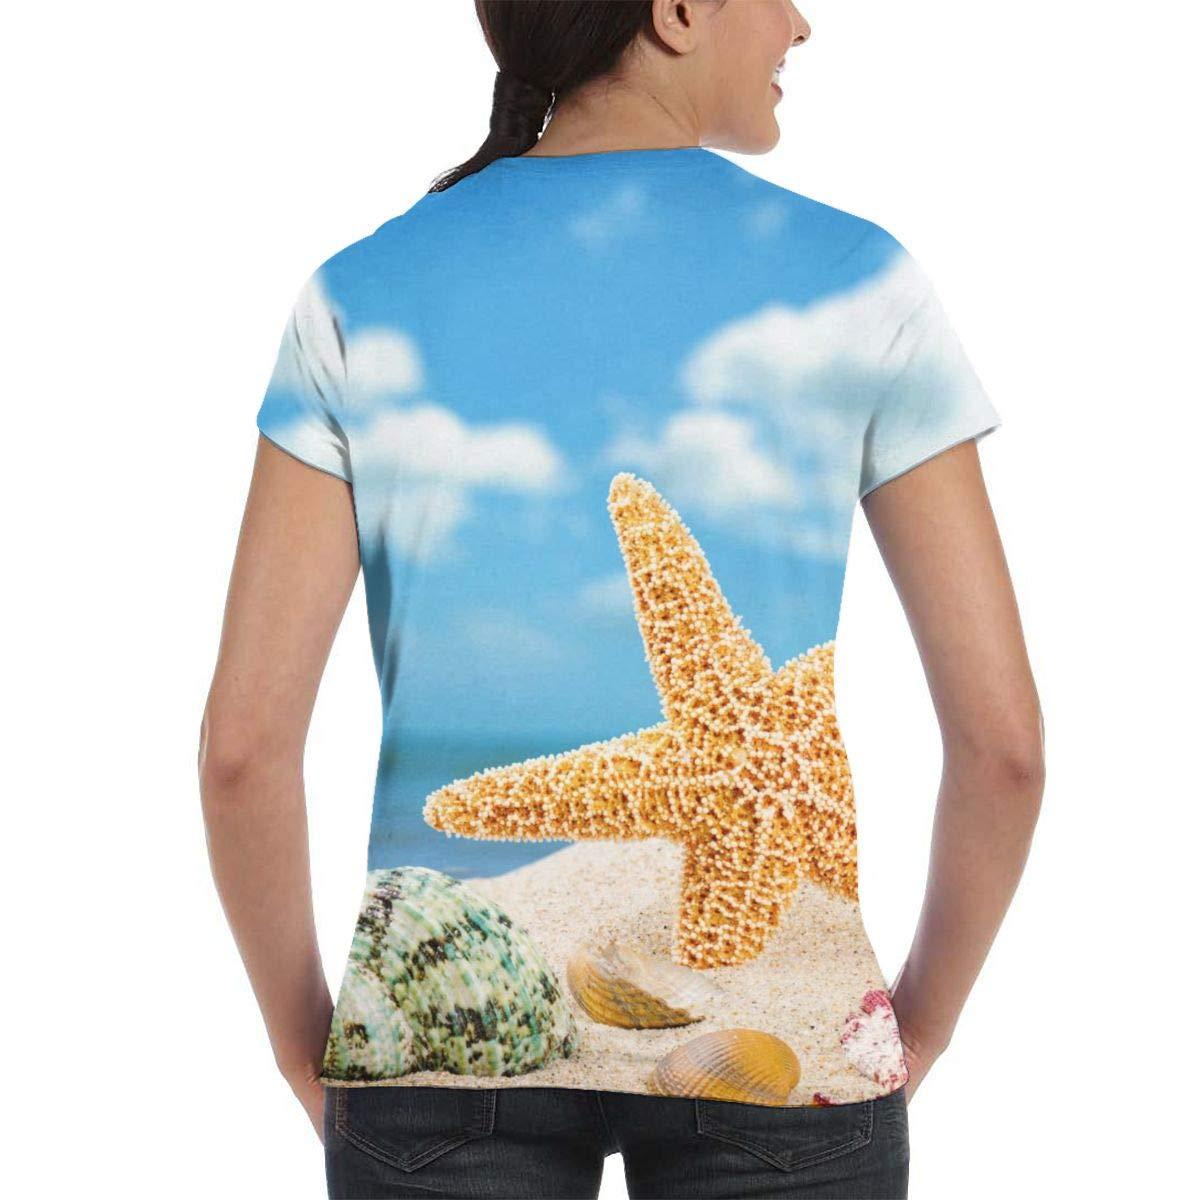 NuoKeSi Network Beach Shells and Starfish Womens Fashion Round Neck Loose Sports Casual T-Shirt Wild Short Sleeve